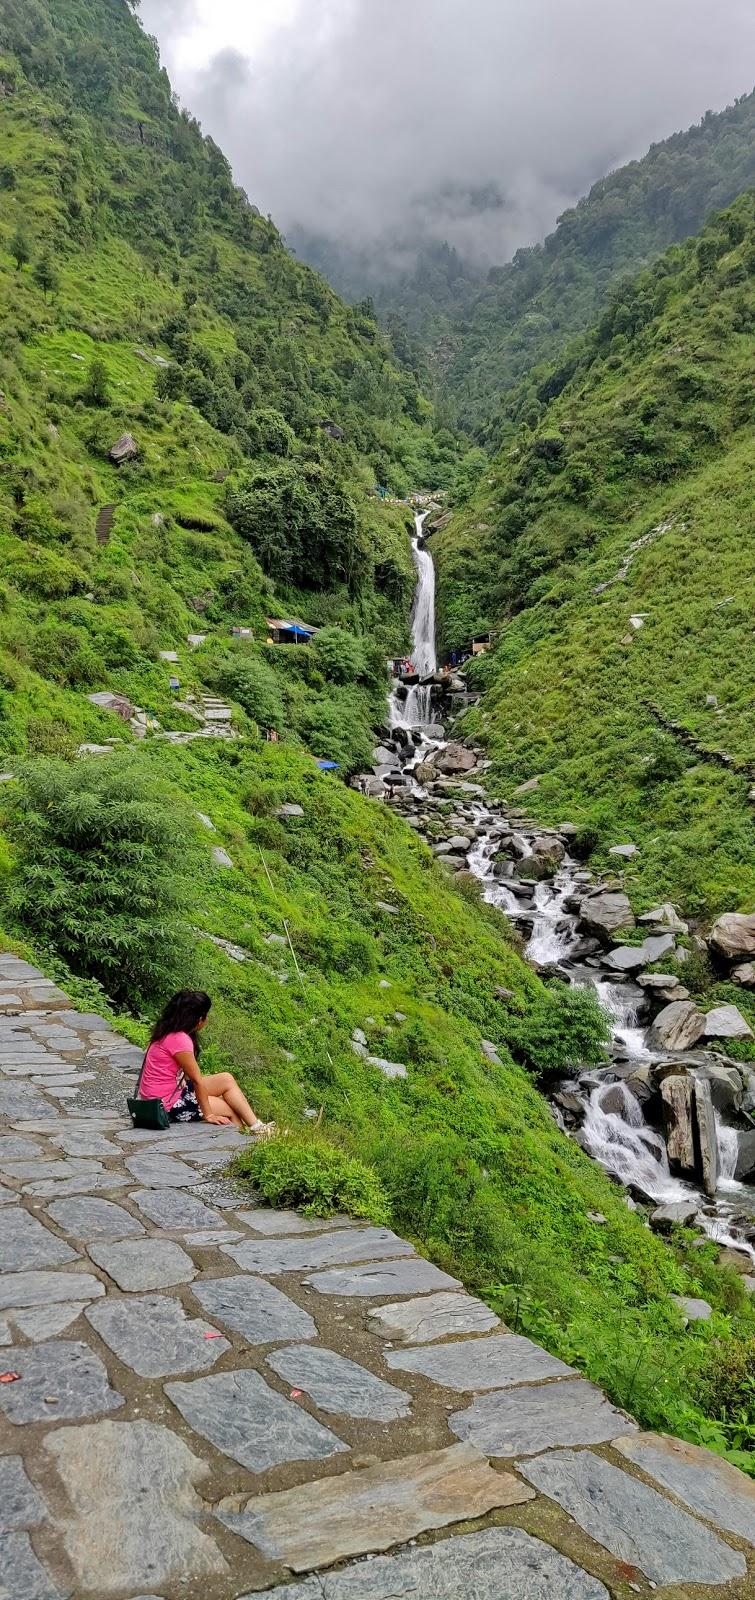 Trip to Dharamshala and McLeodganj- Bhagsu Falls